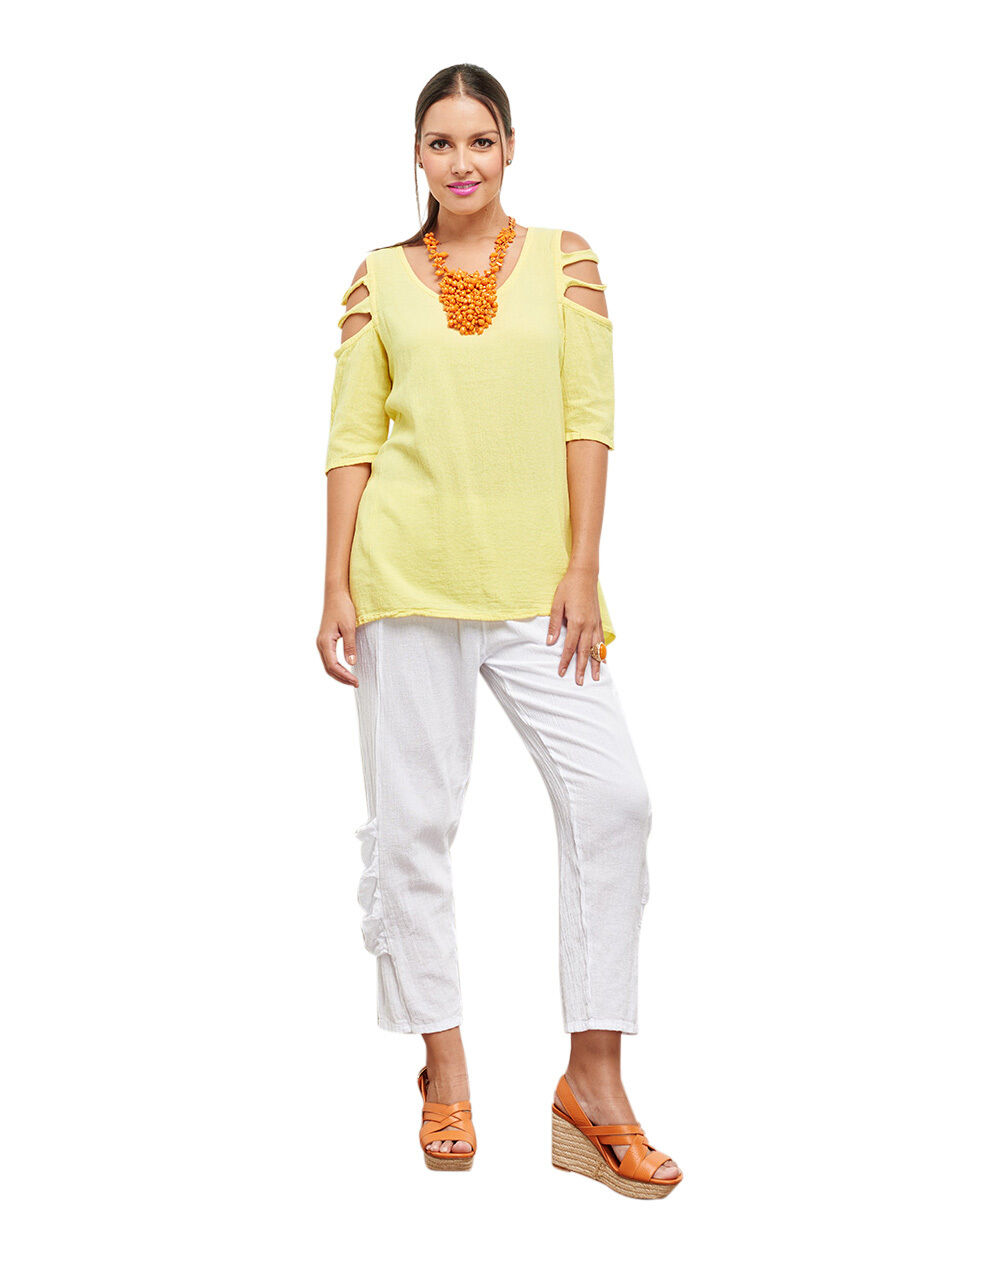 Oh My Gauze Miami Blouse Half Sleeve Tunic Top 100% Cotton Lagenlook